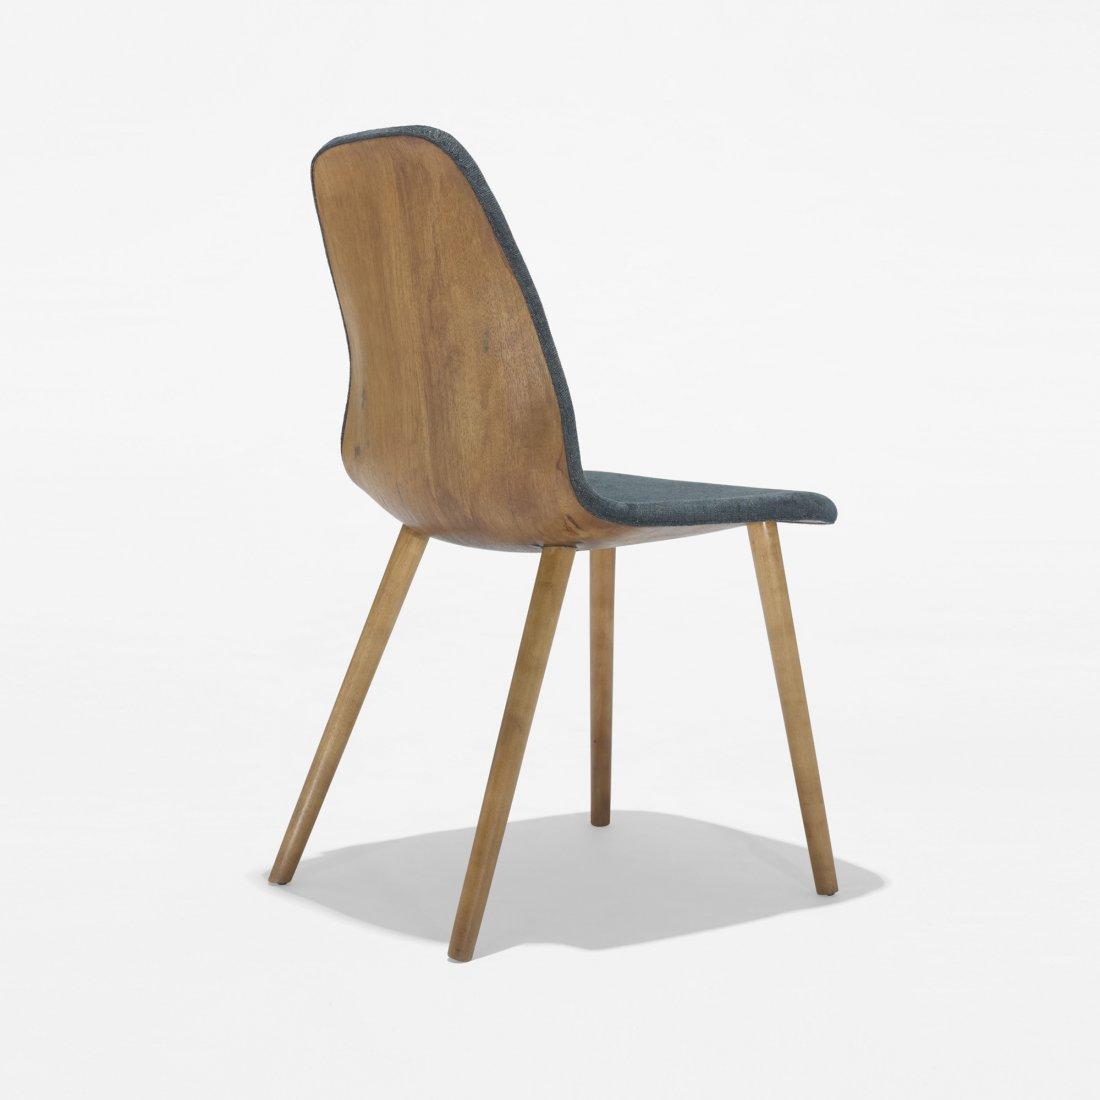 123: Eames and Saarinen chair